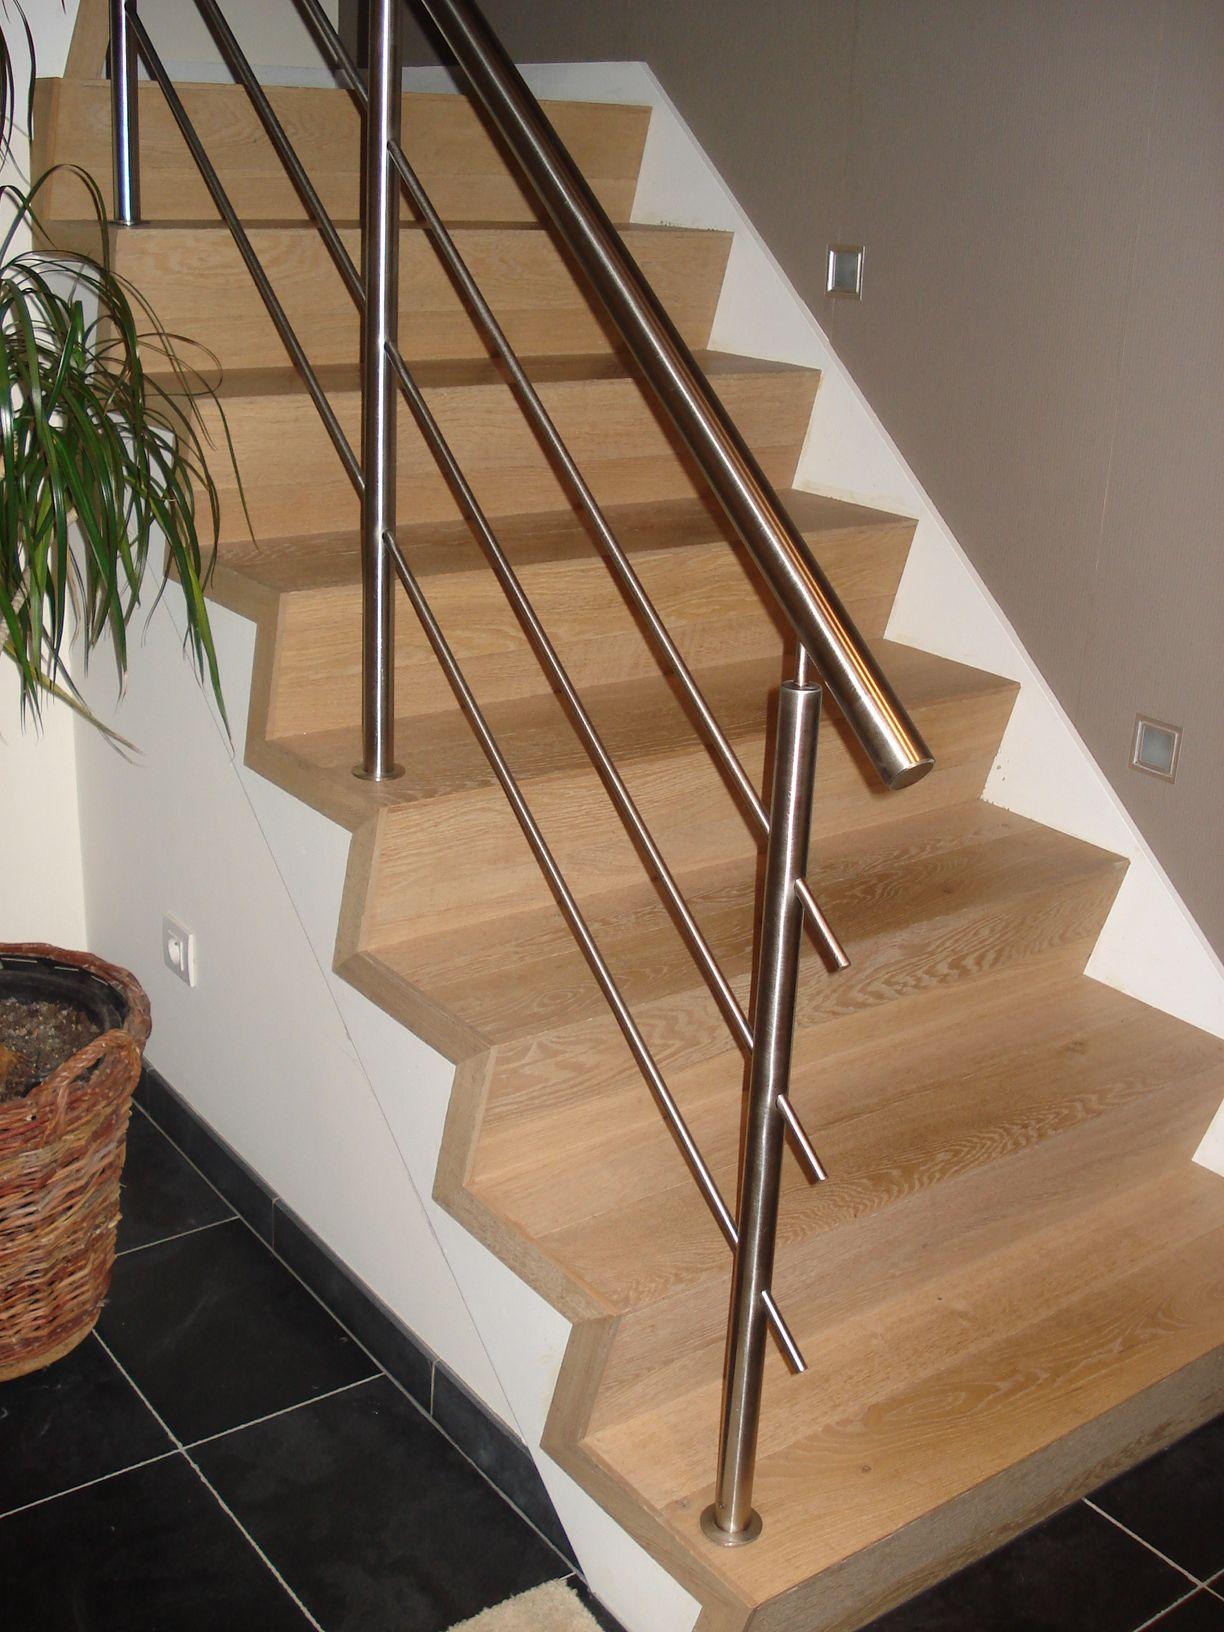 Betonnen trap bekleden met multiplex massief franse eik for Open trap bekleden met hout